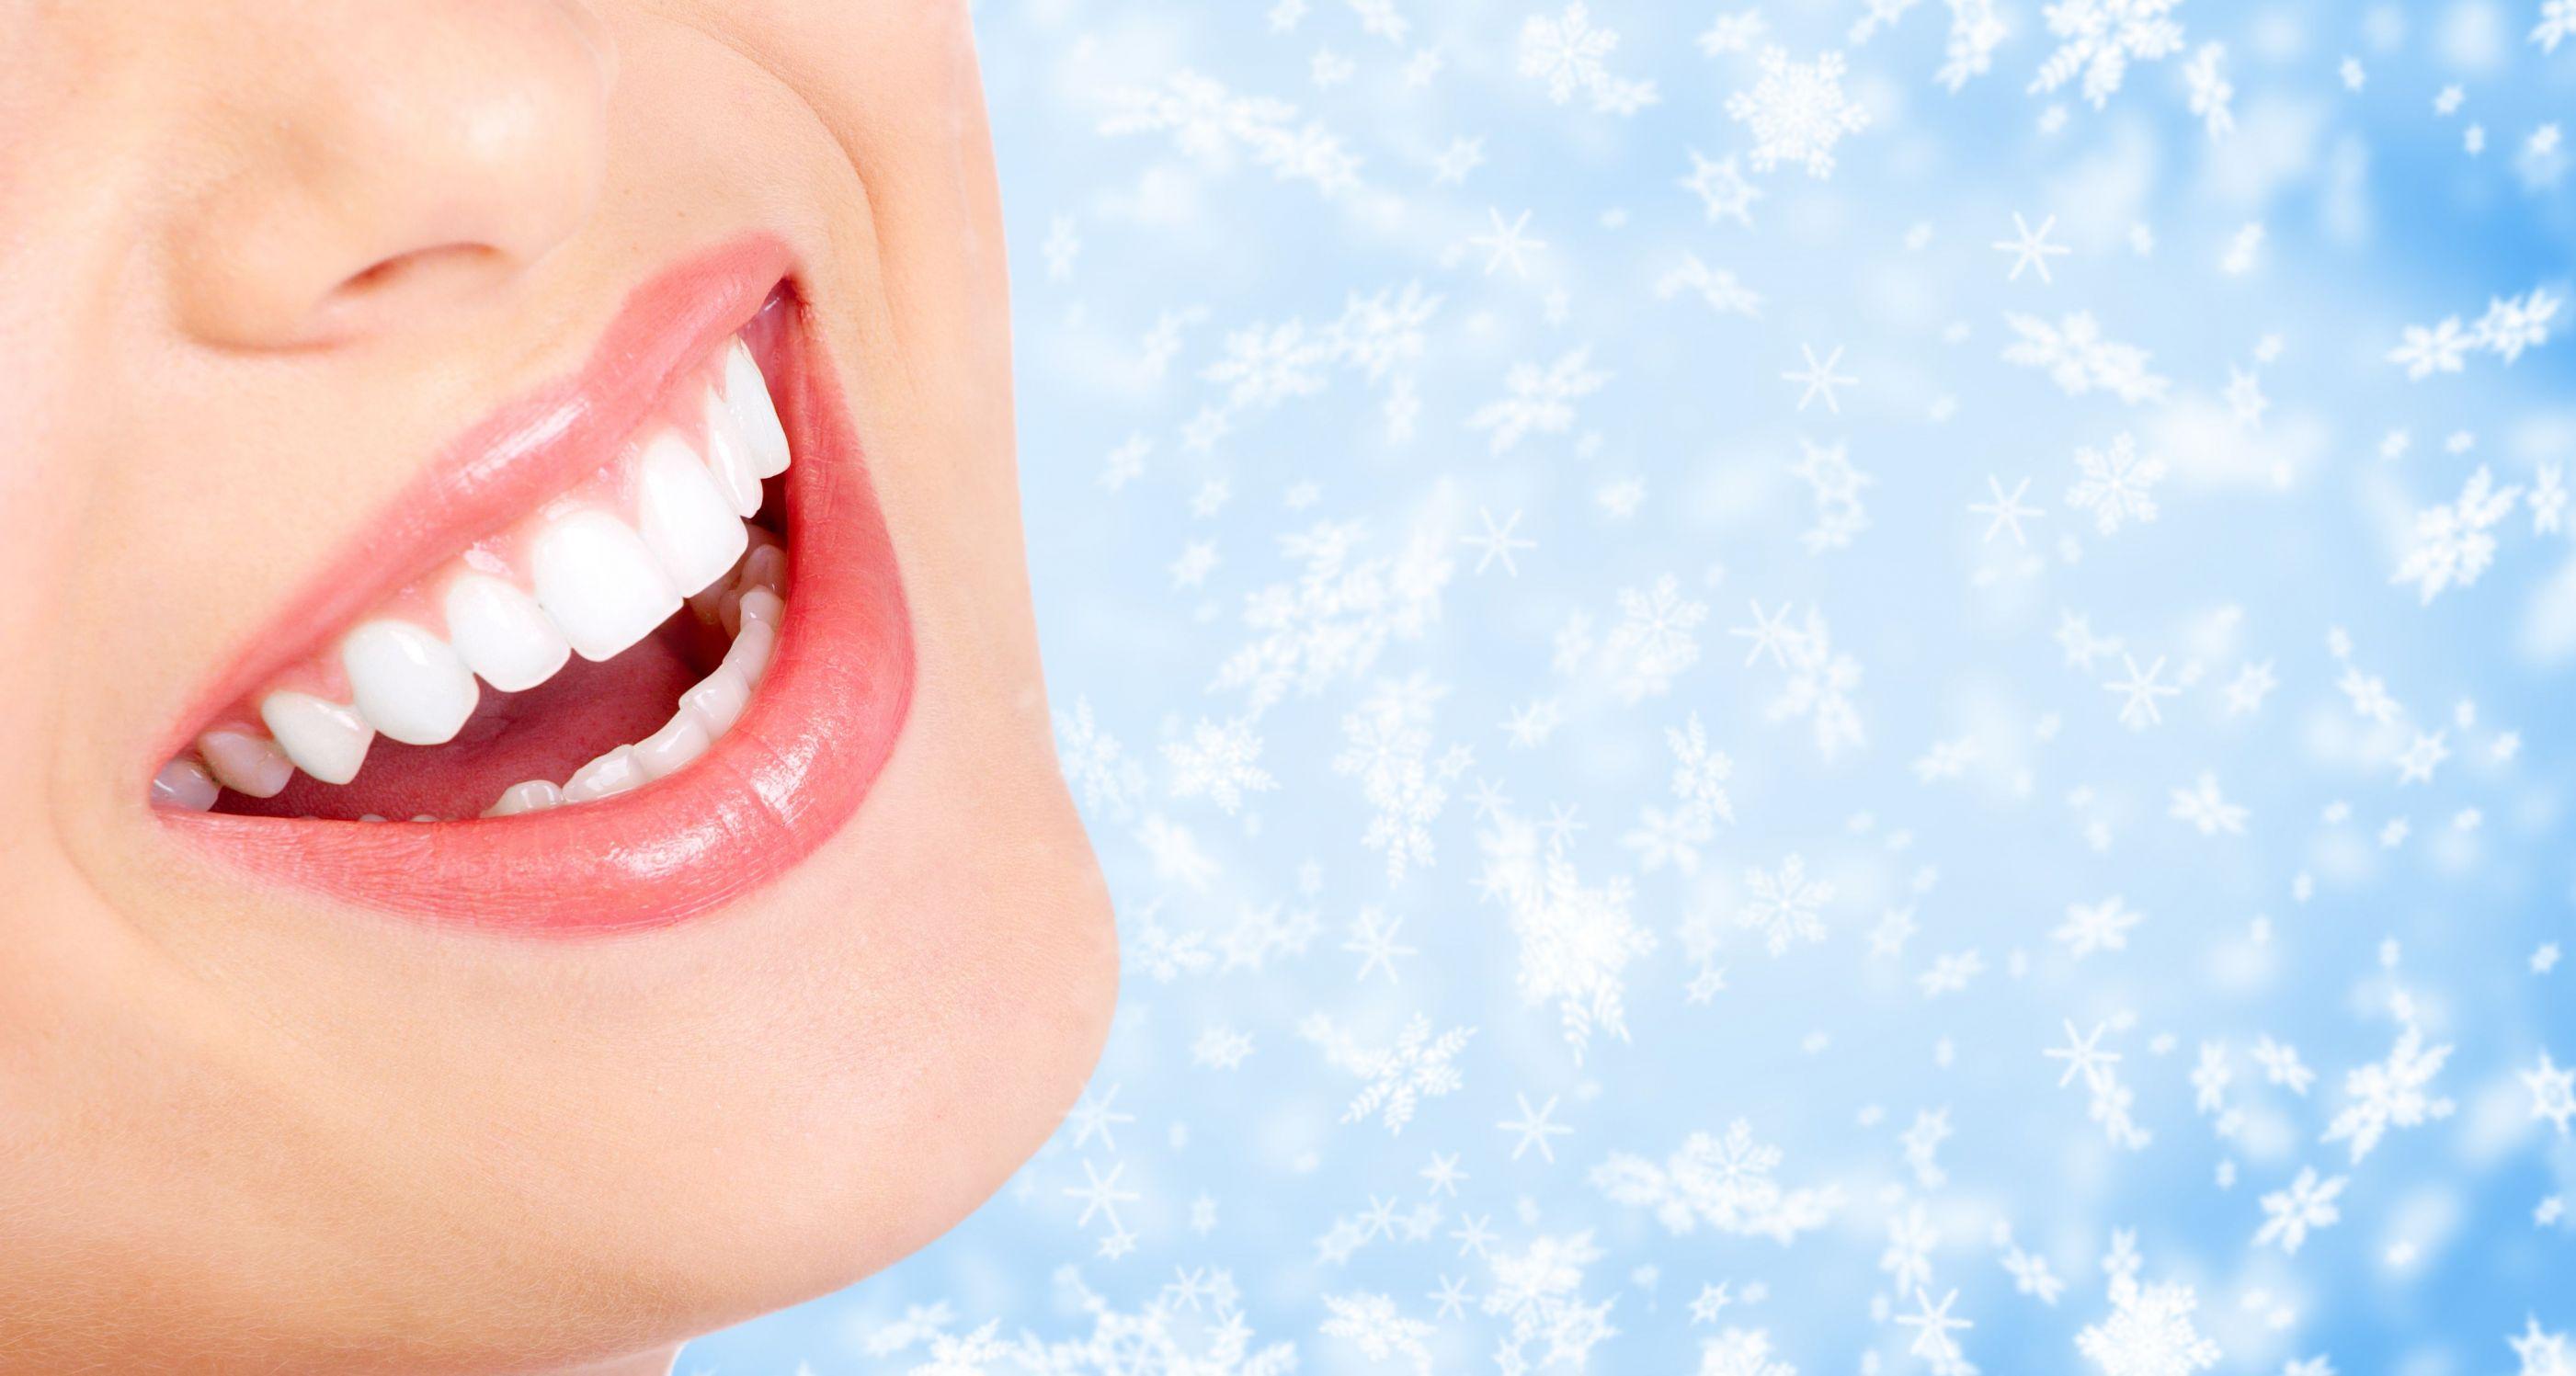 The Best Dental Plans - Finding the Best Dental Plan